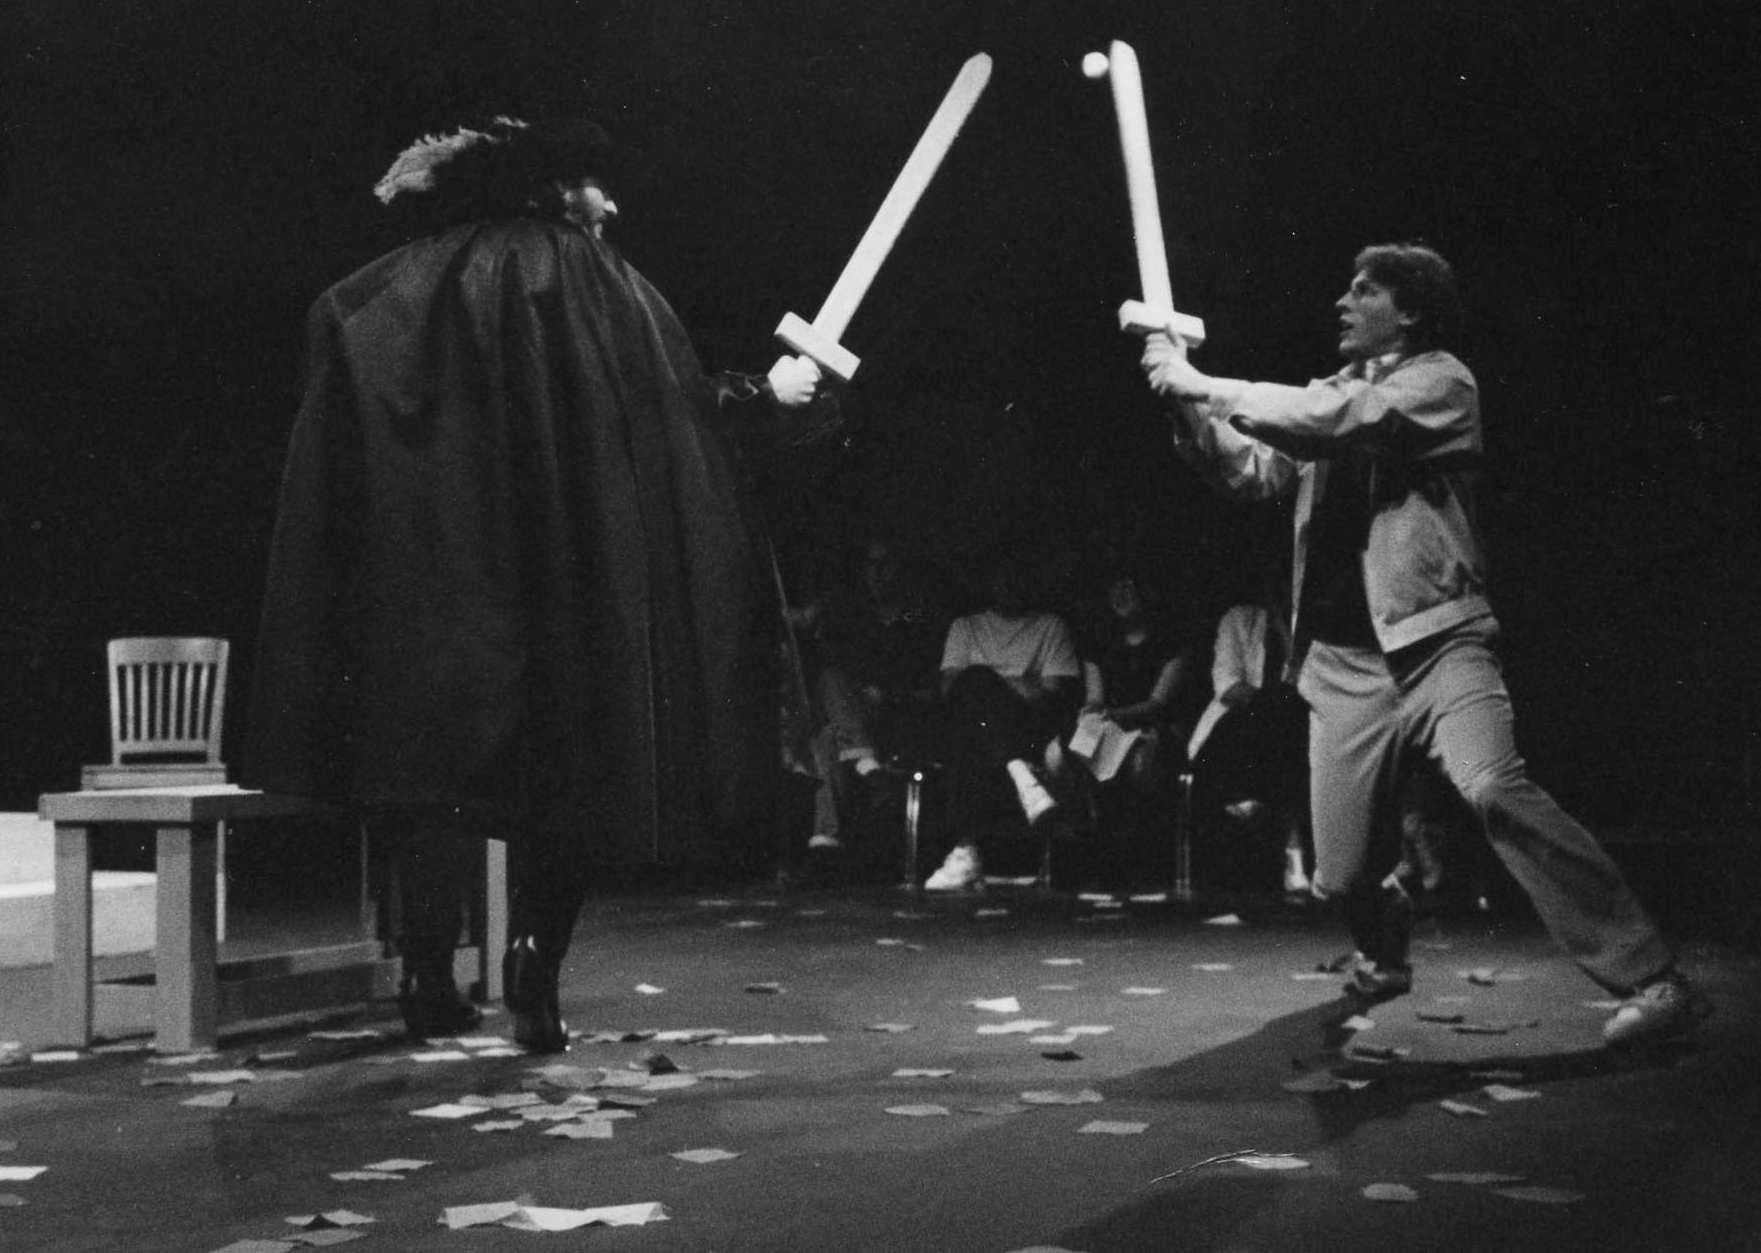 The Fantasticks - fight scene